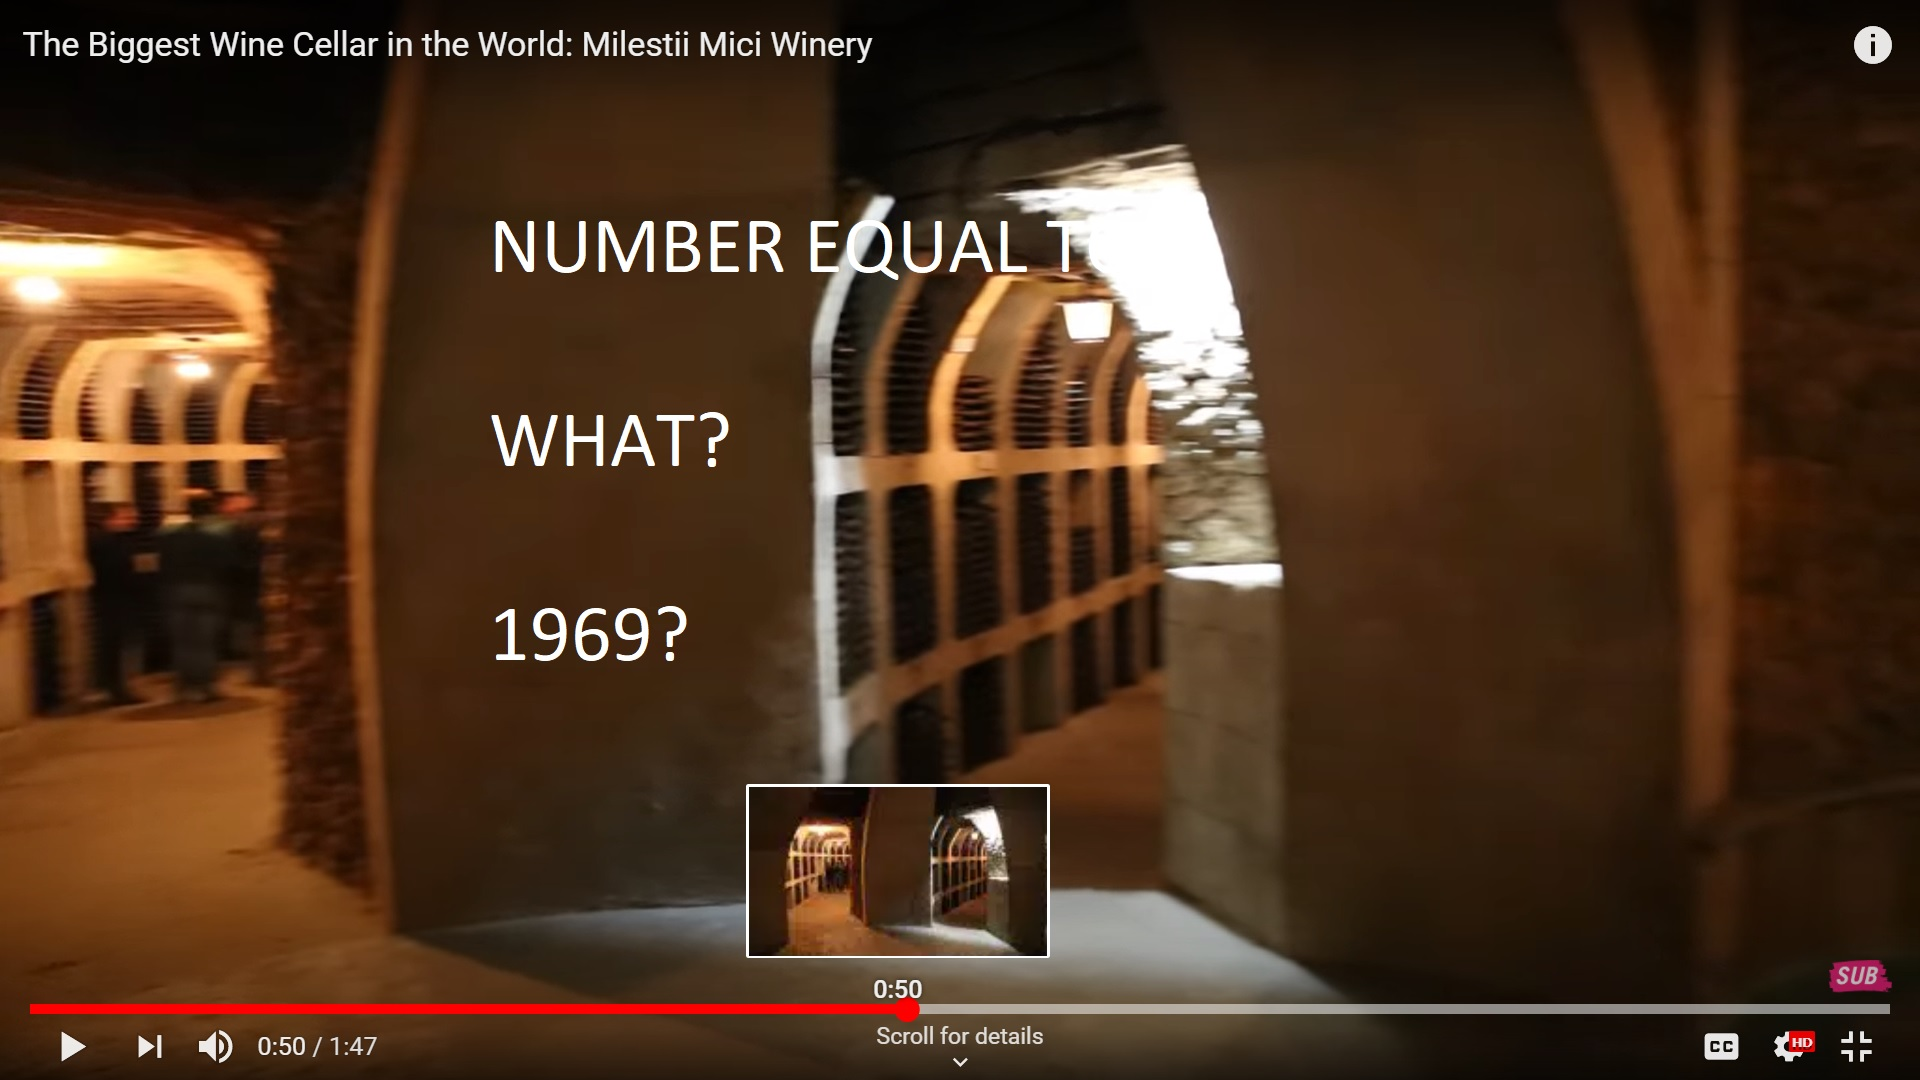 WINE FROM MOLDOVA 1969